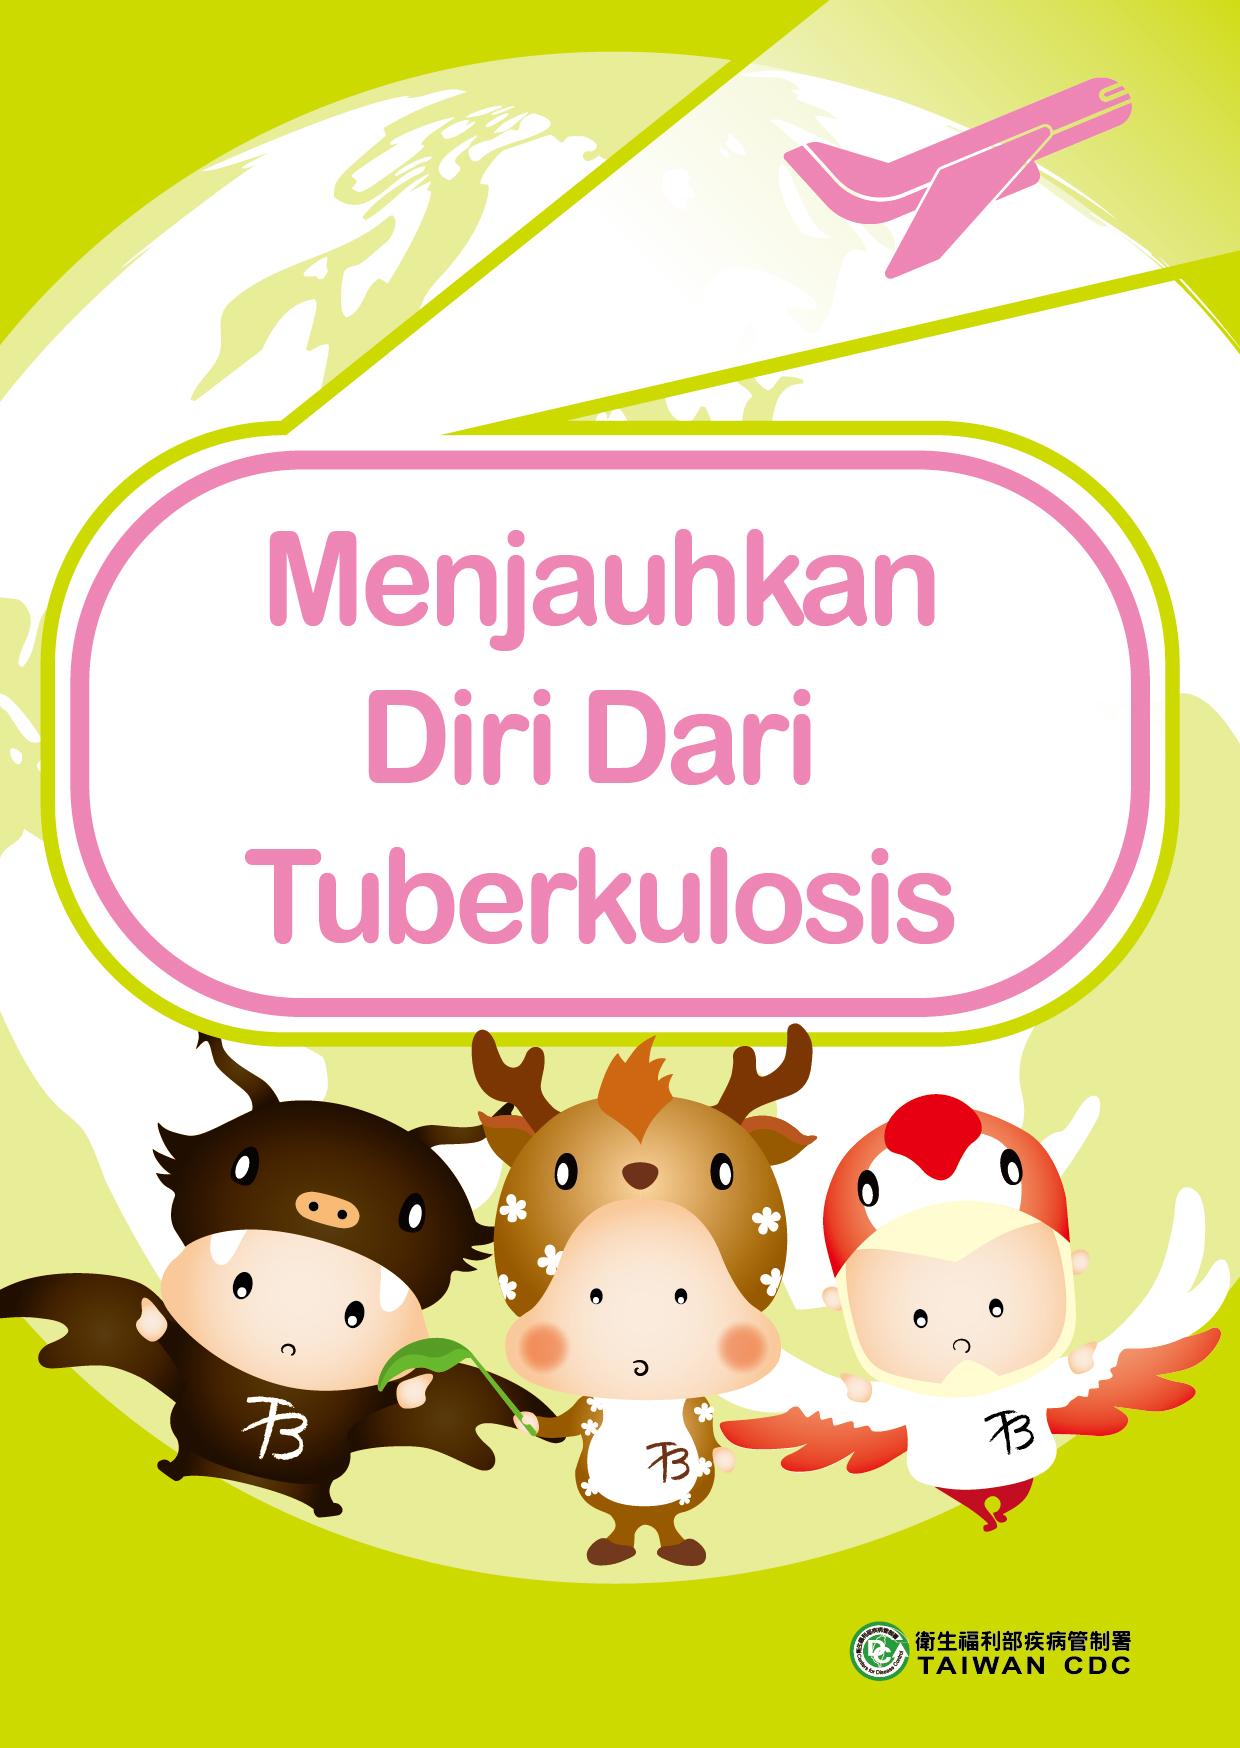 詳如附件【Klik】Tuberkulosis menular melalui udara(Halaman 1)核病透過空氣傳染,請保持室內環境通風(印尼文)